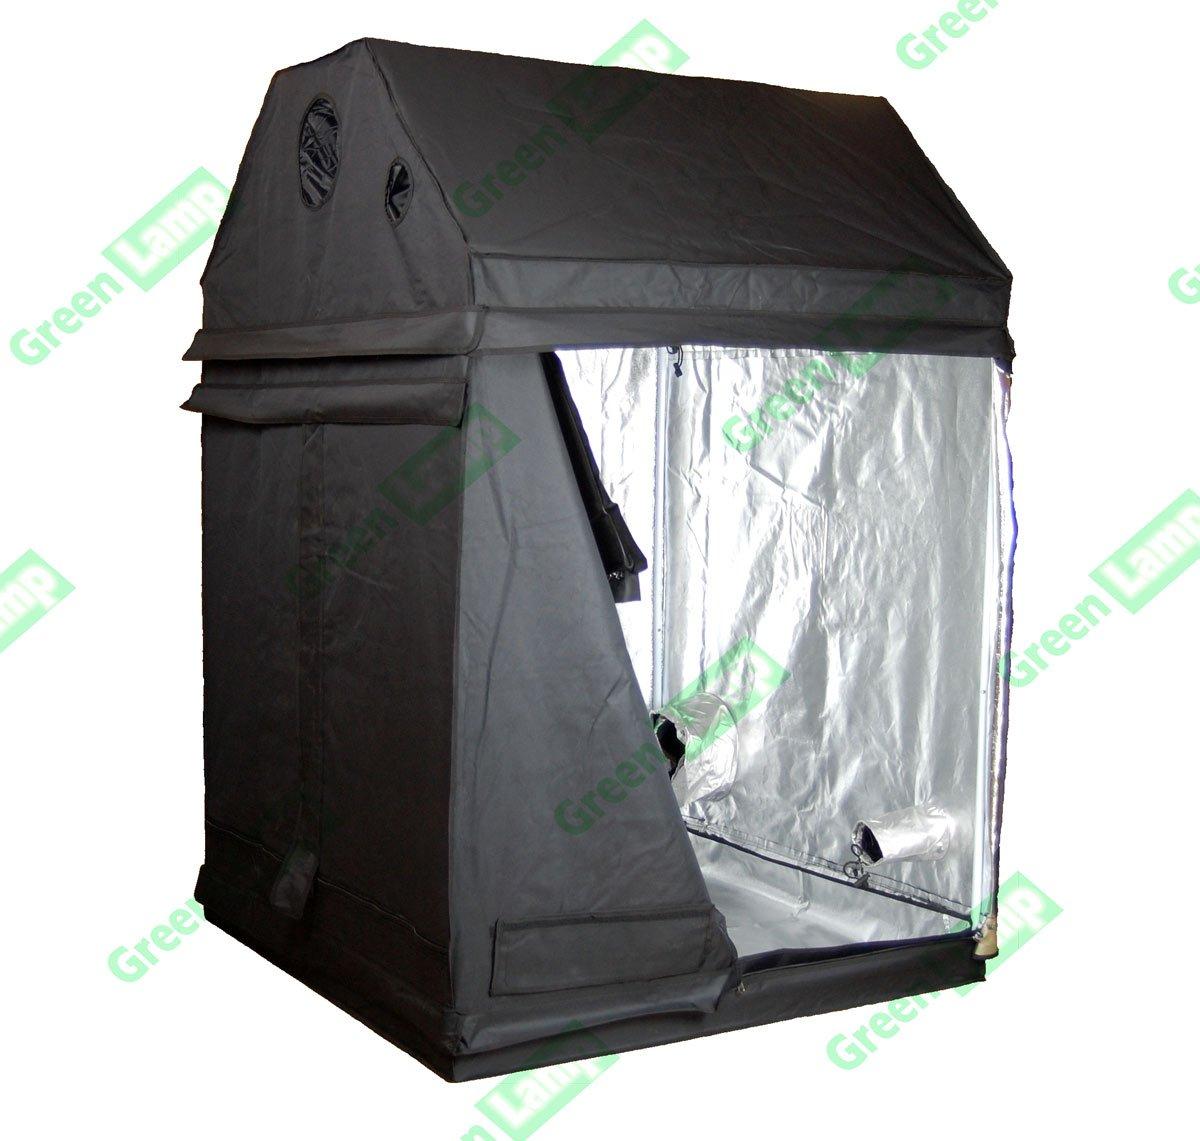 Green Lamp Premium Loft 150 x 150 x 160cm 600D Mylar Indoor Attic Grow Tent Box Hydroponics Dark Room